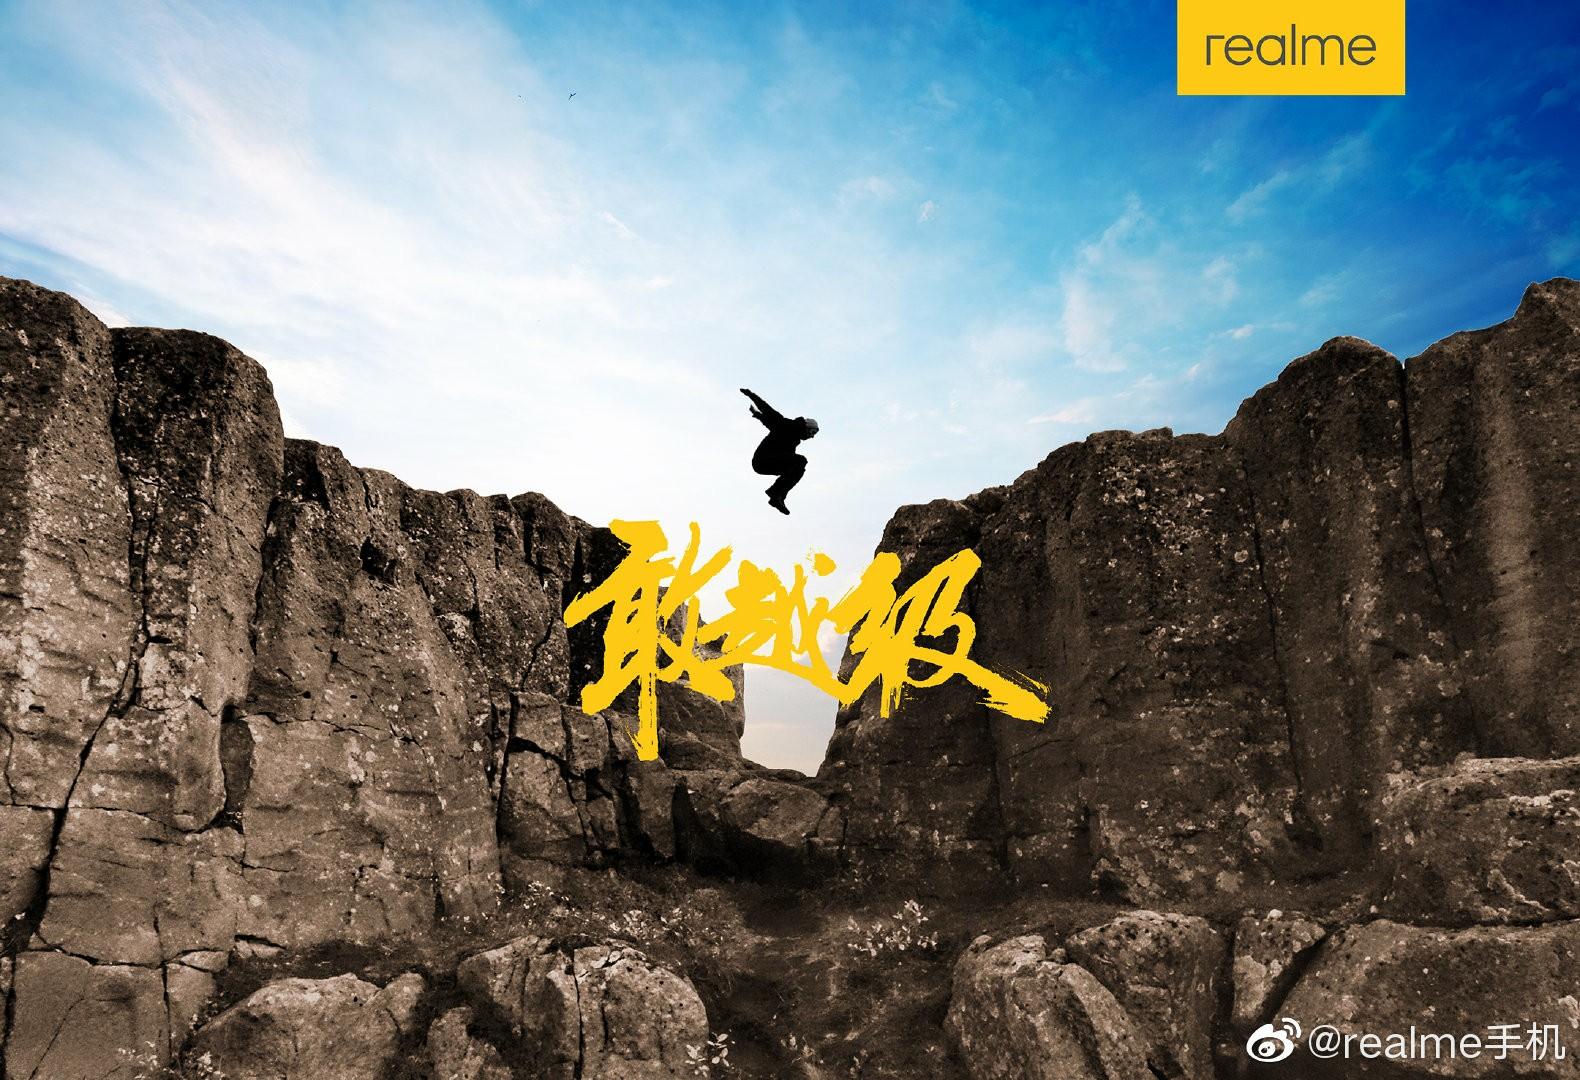 Realme China